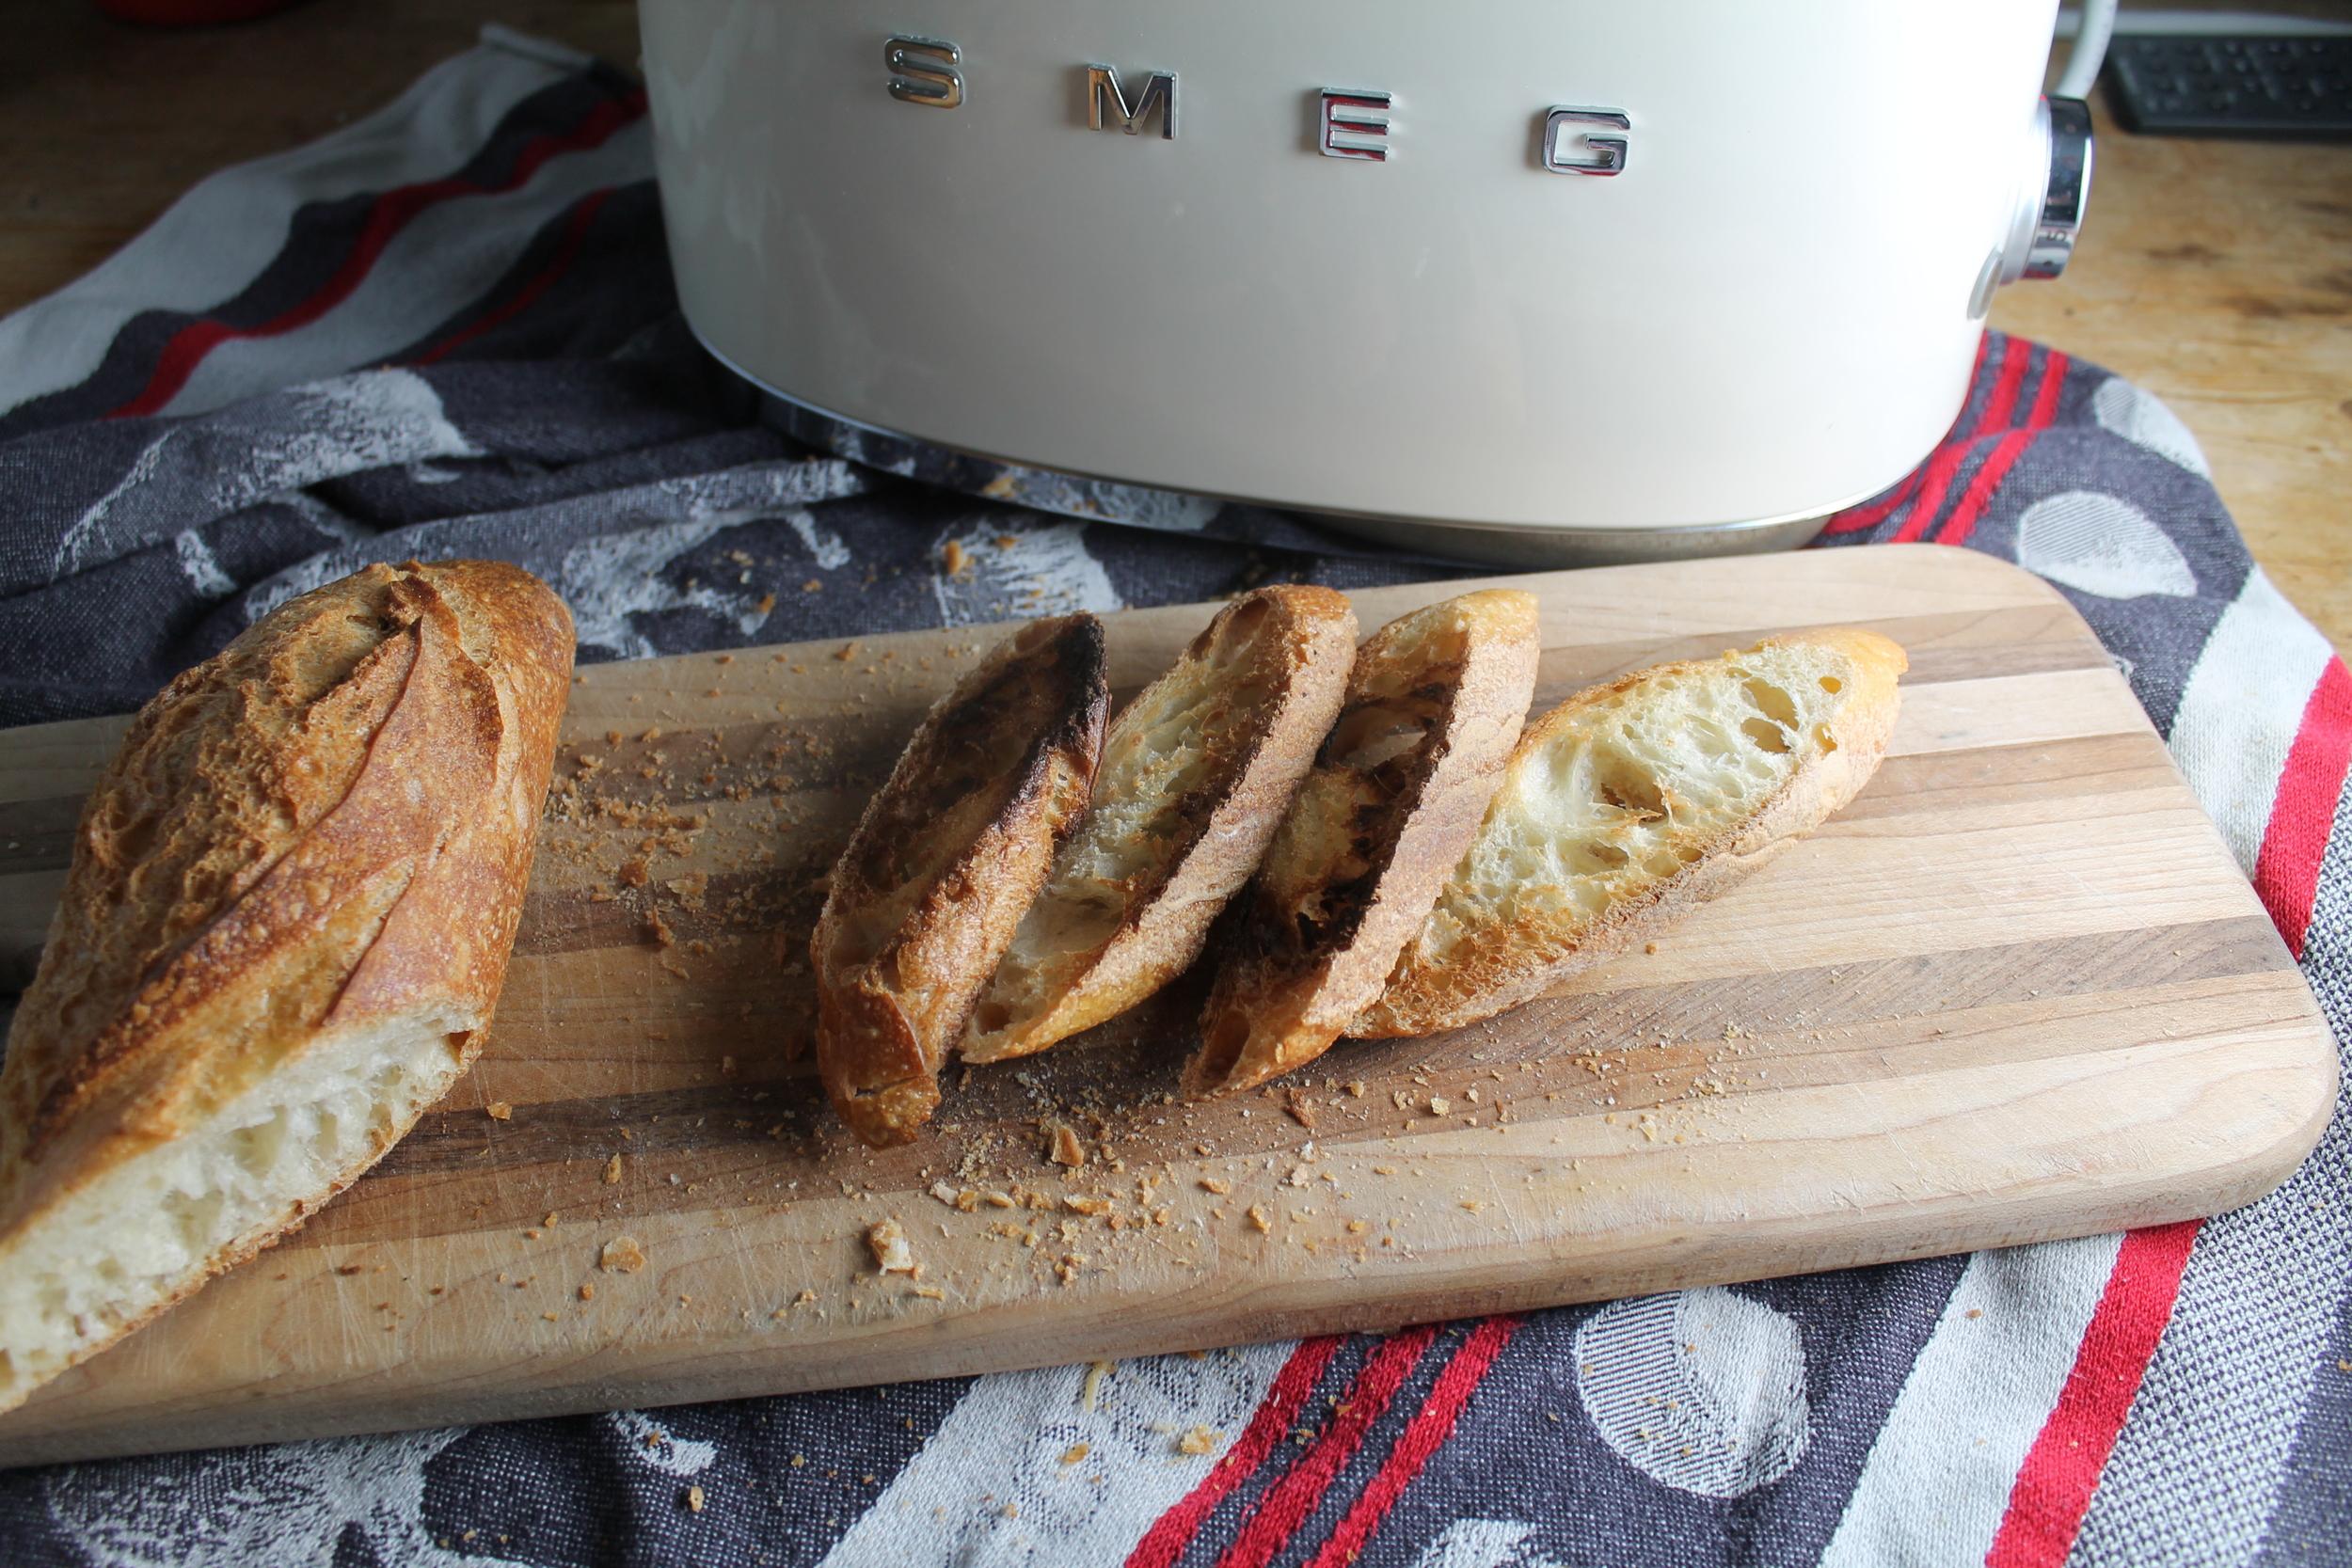 Toast | www.hungryinlove.com